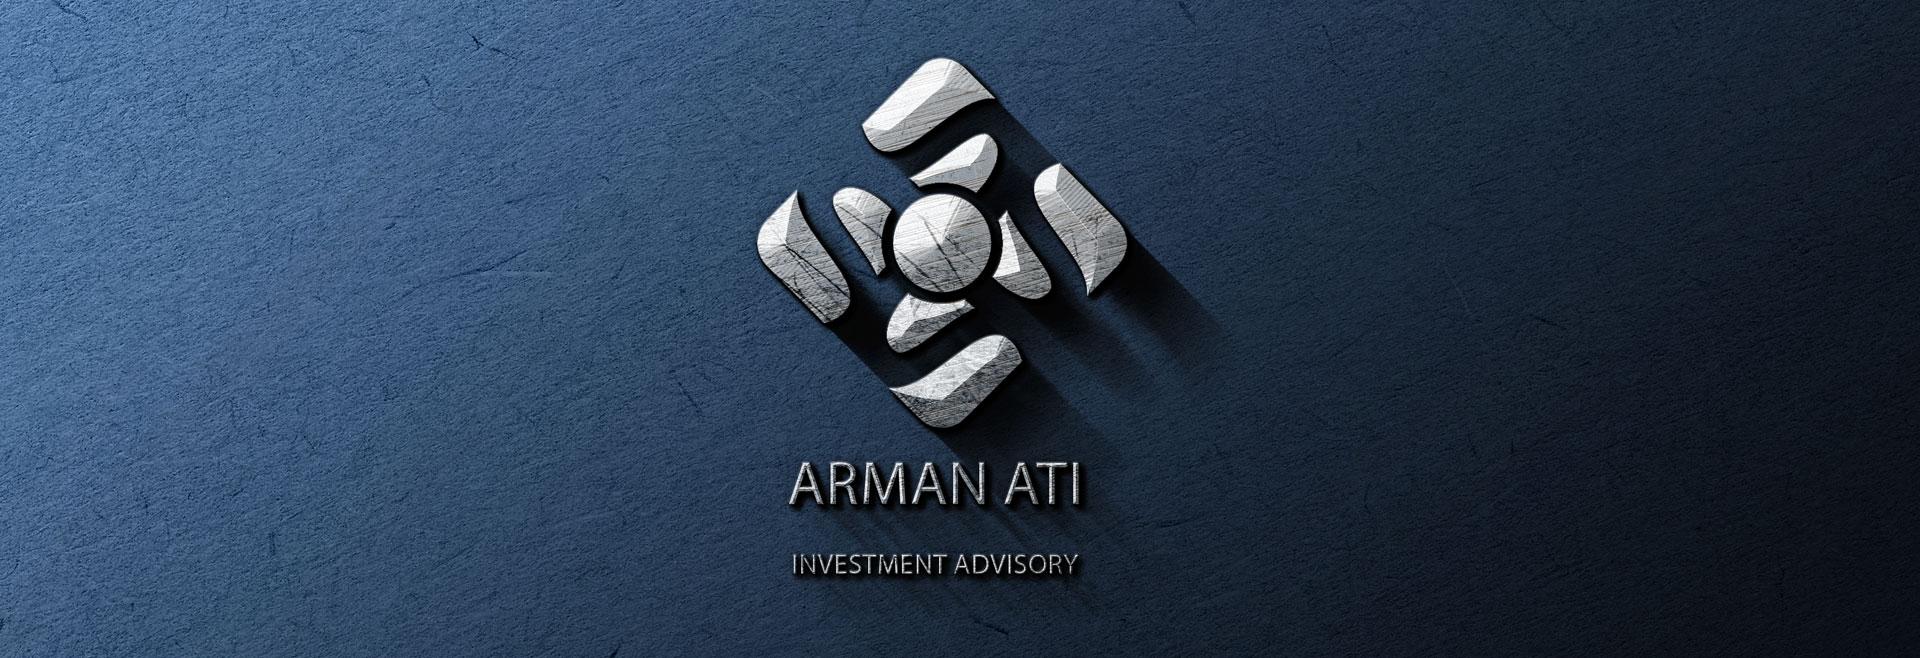 arman ati investment